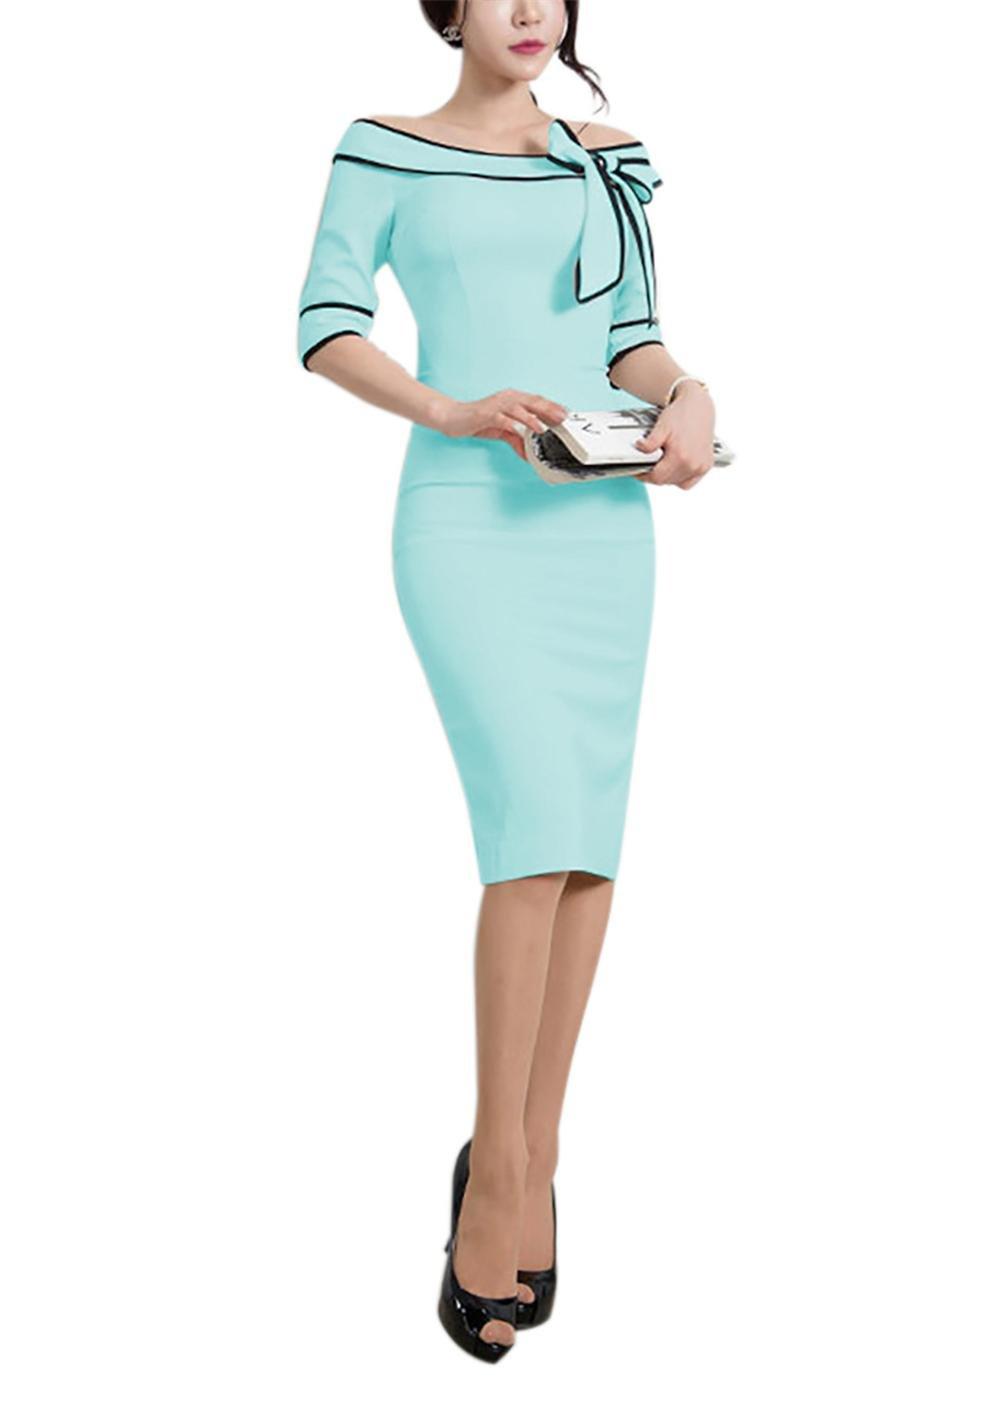 HELYO Career Female Work Dresses for Women Knees Length Summer Elegant Bodycon Pencil Dress 172 (XL, Blue)